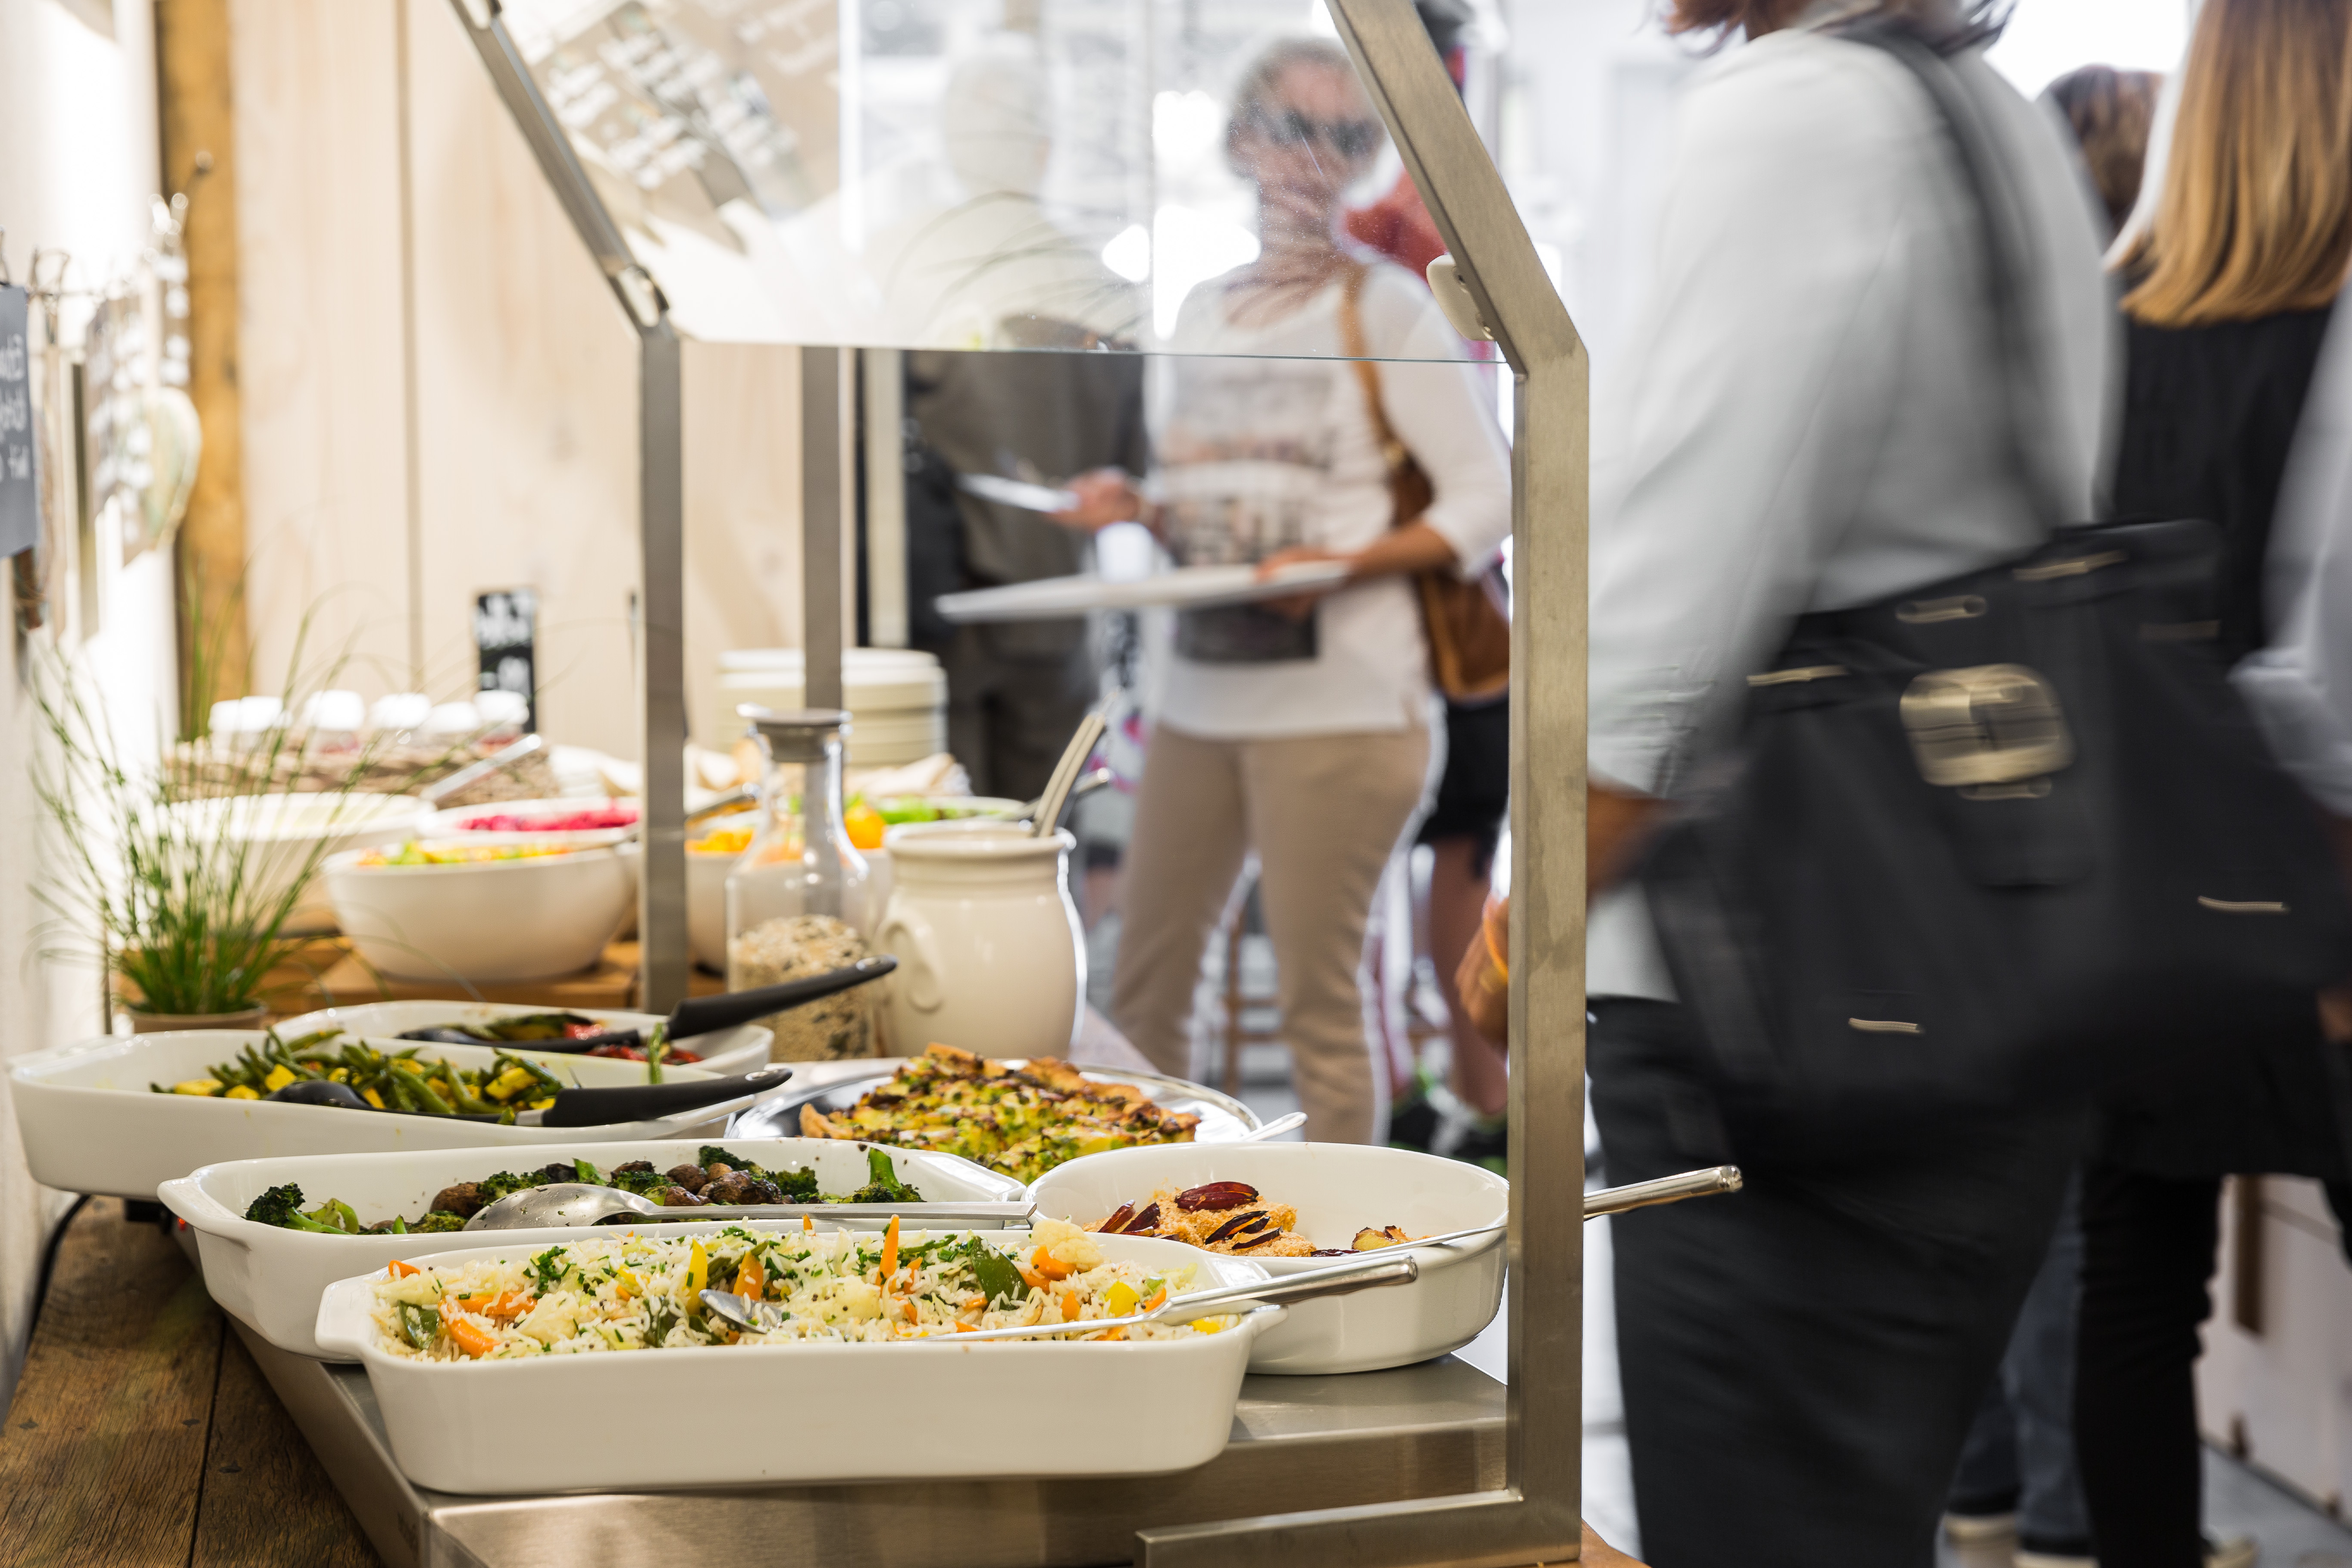 Herzlich Vegetarisches Restaurant & Takeaway In Liestal With Espresso Wood Multi Use Buffets (View 20 of 20)